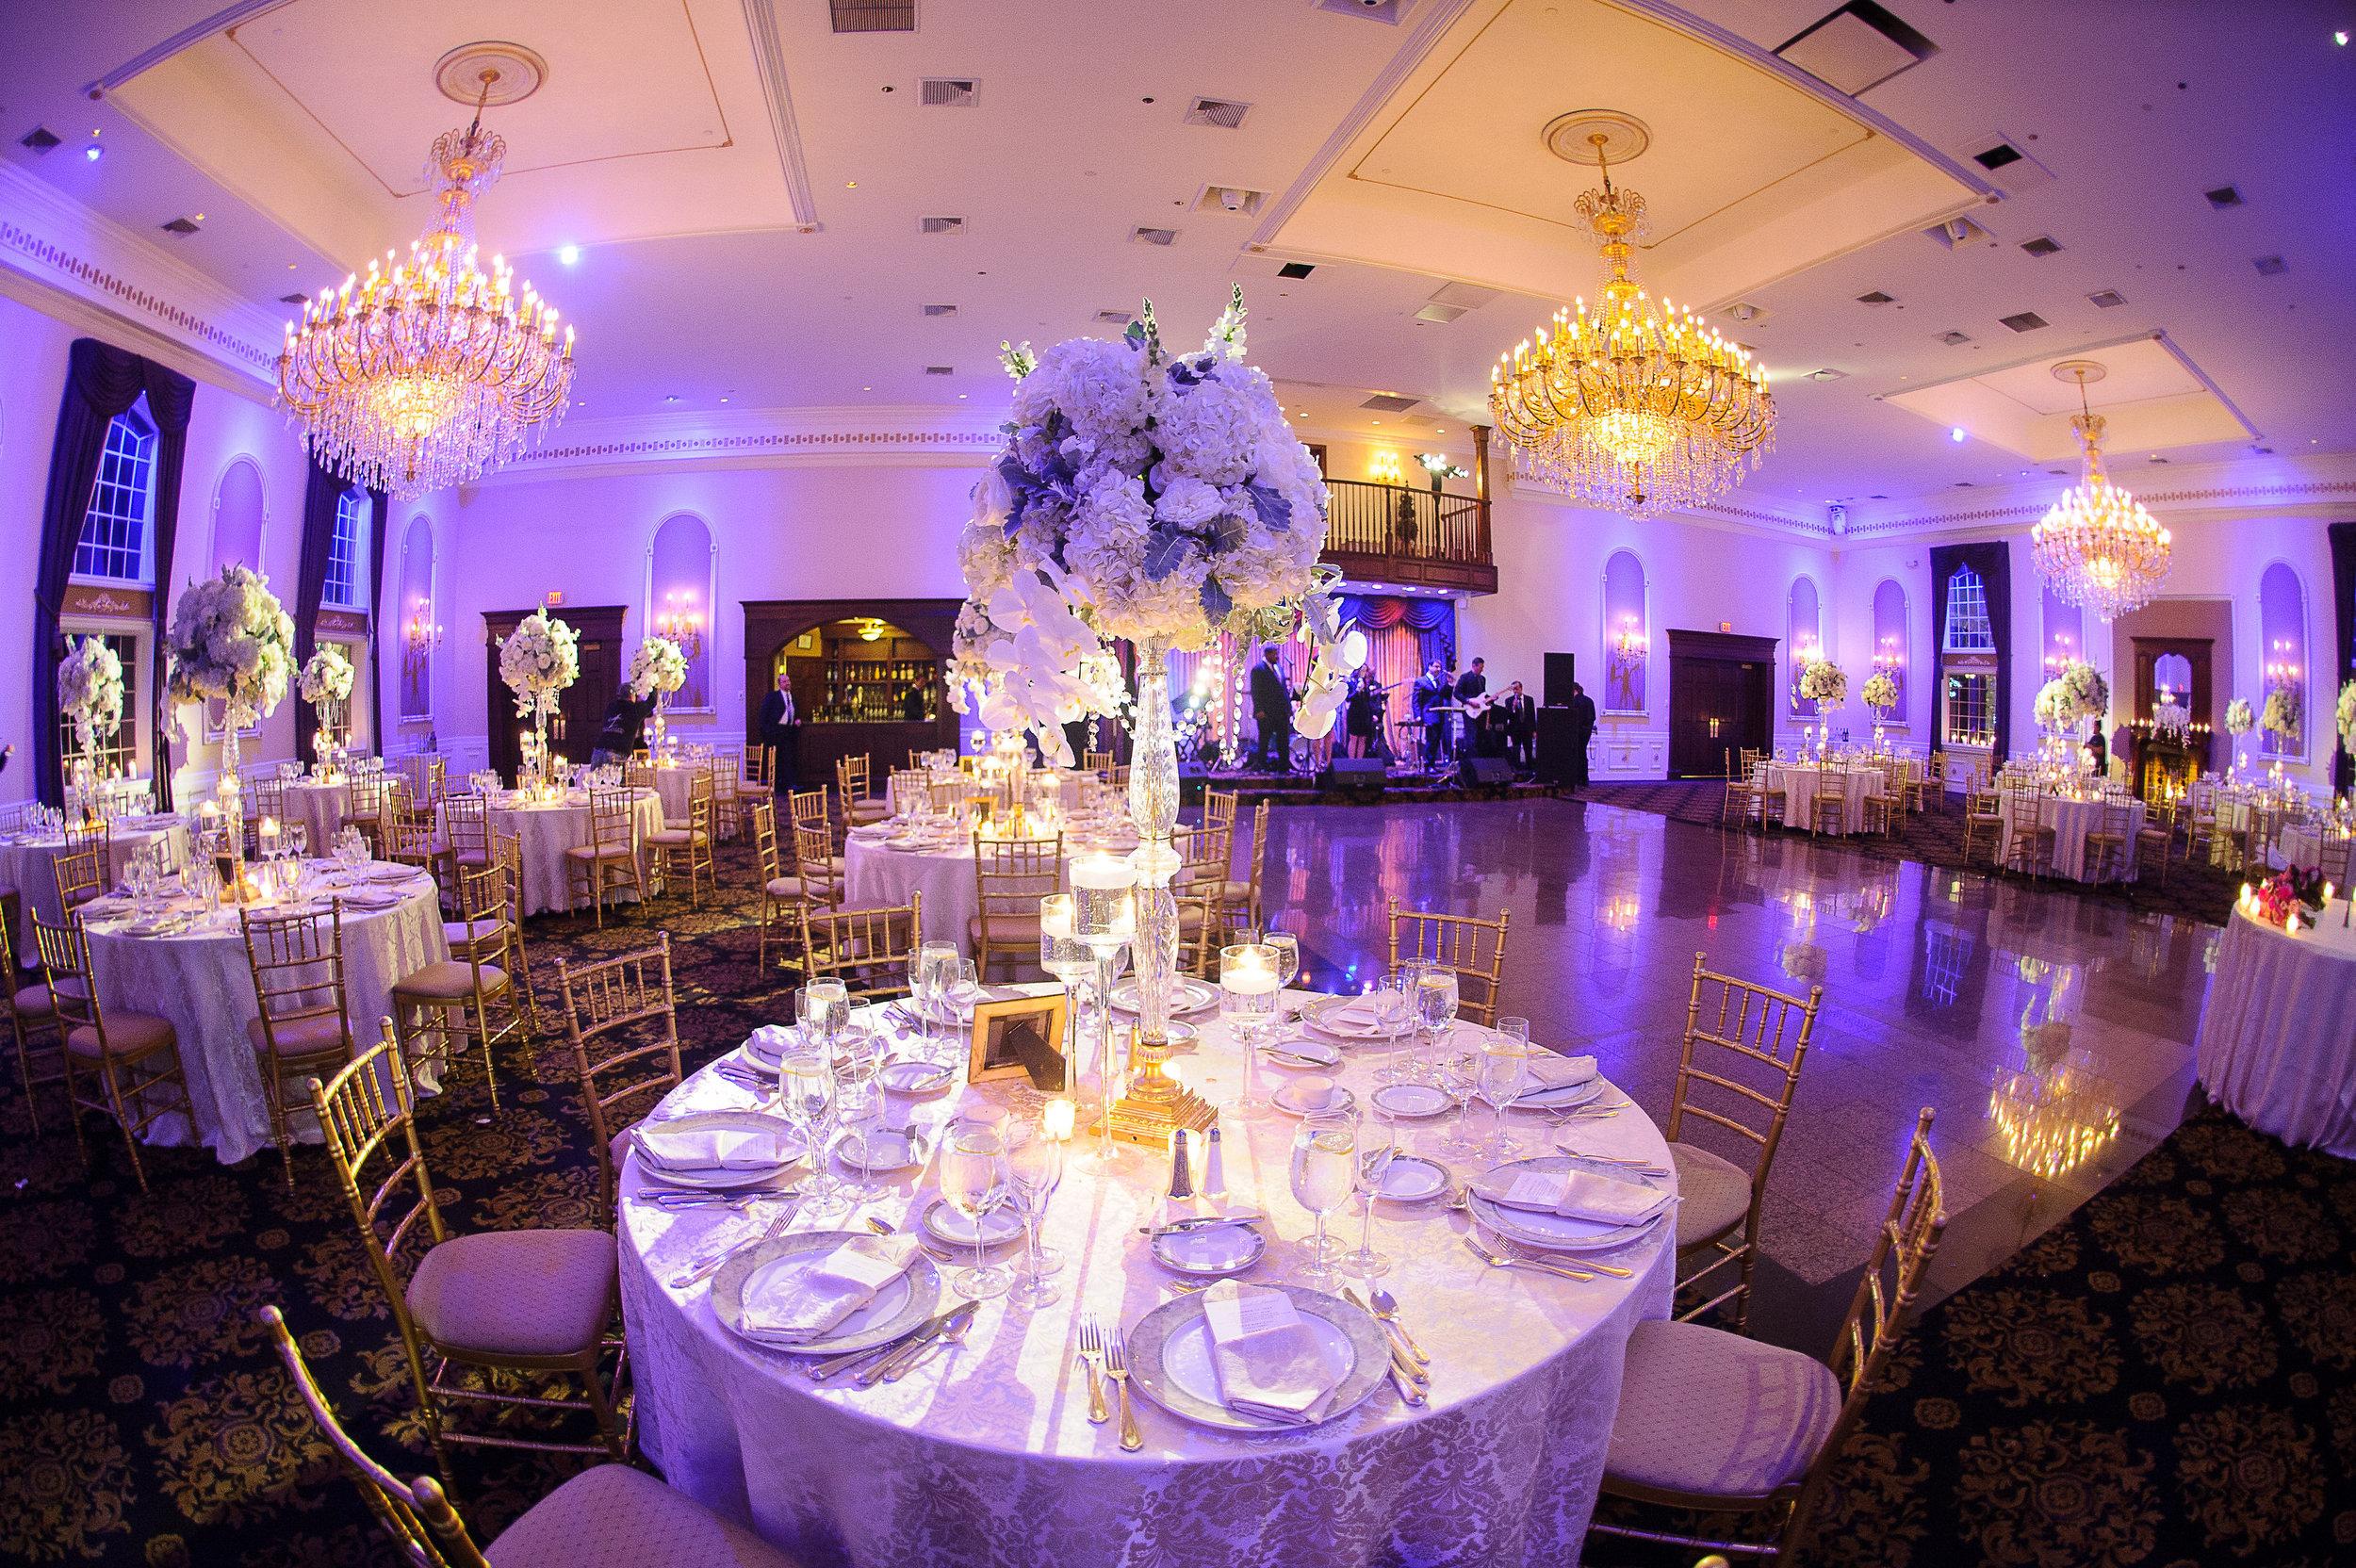 Ceci_New_York_Custom_Invitation_ New_Jersey_Wedding_Luxury_Personalized_Ceci_Style_Bride_Foil_Stamping113.JPG